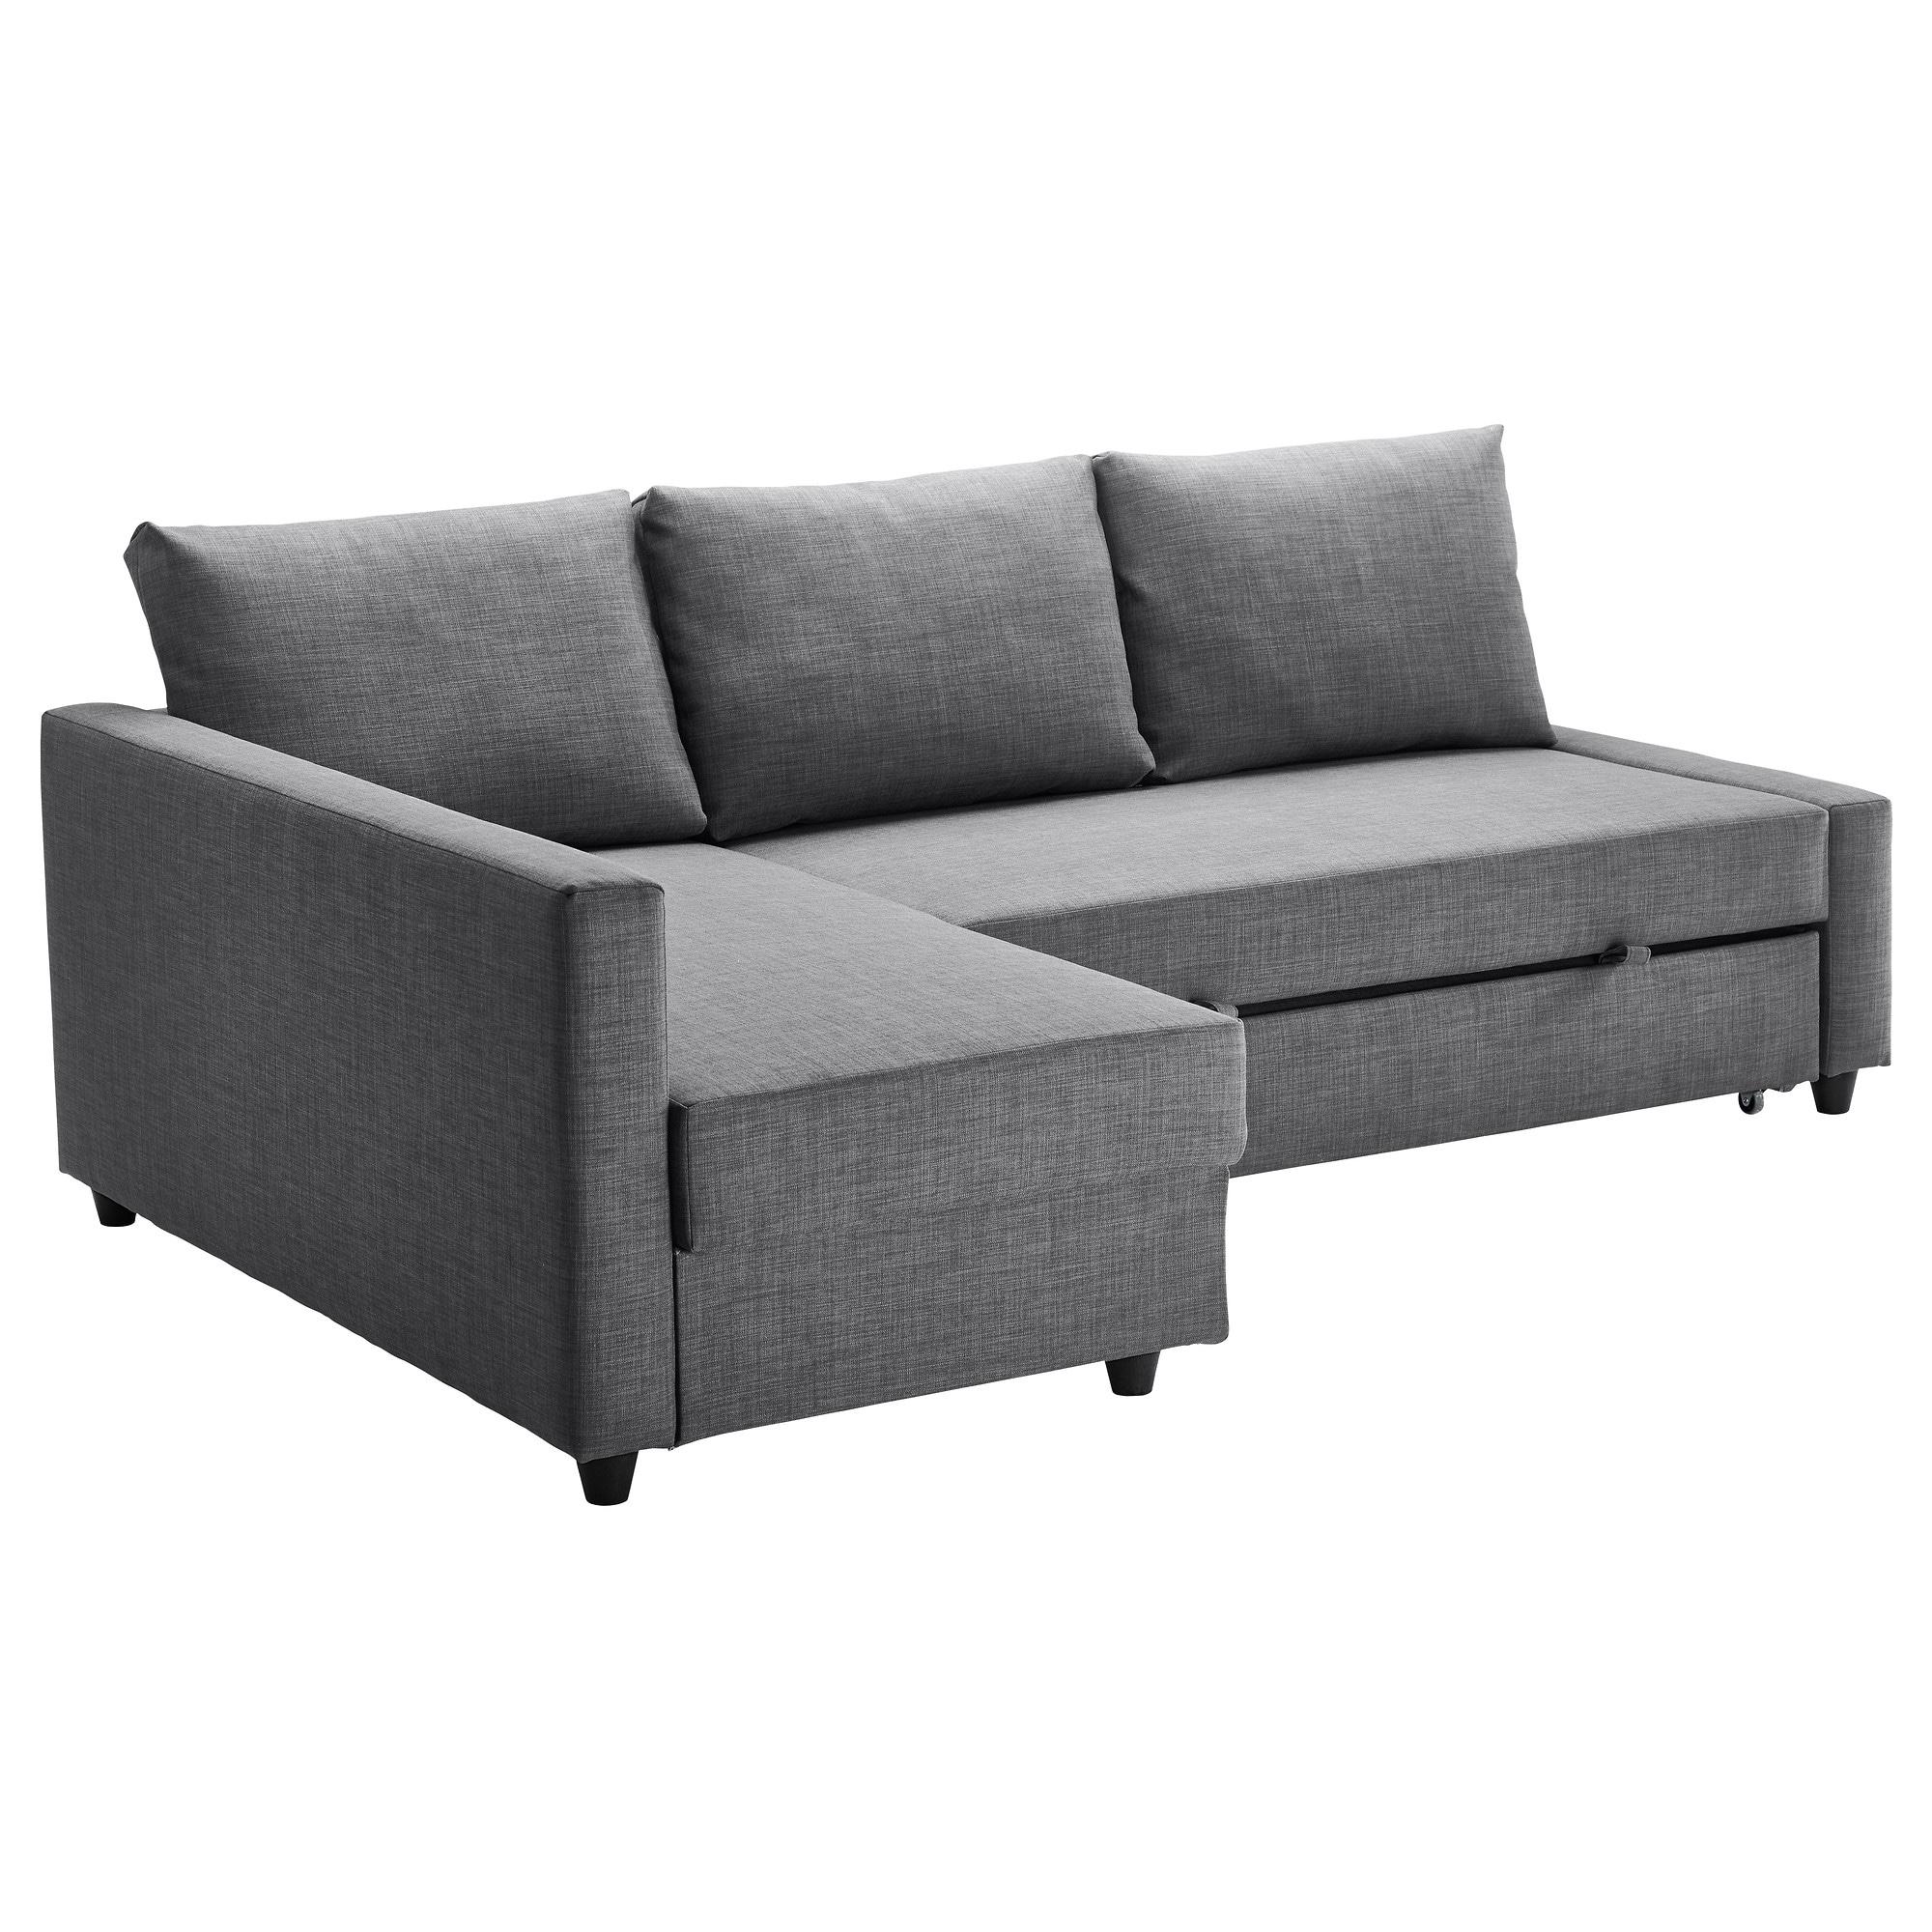 Popular Friheten Corner Sofa Bed With Storage Skiftebo Dark Grey – Ikea Intended For London Dark Grey Sofa Chairs (View 17 of 20)